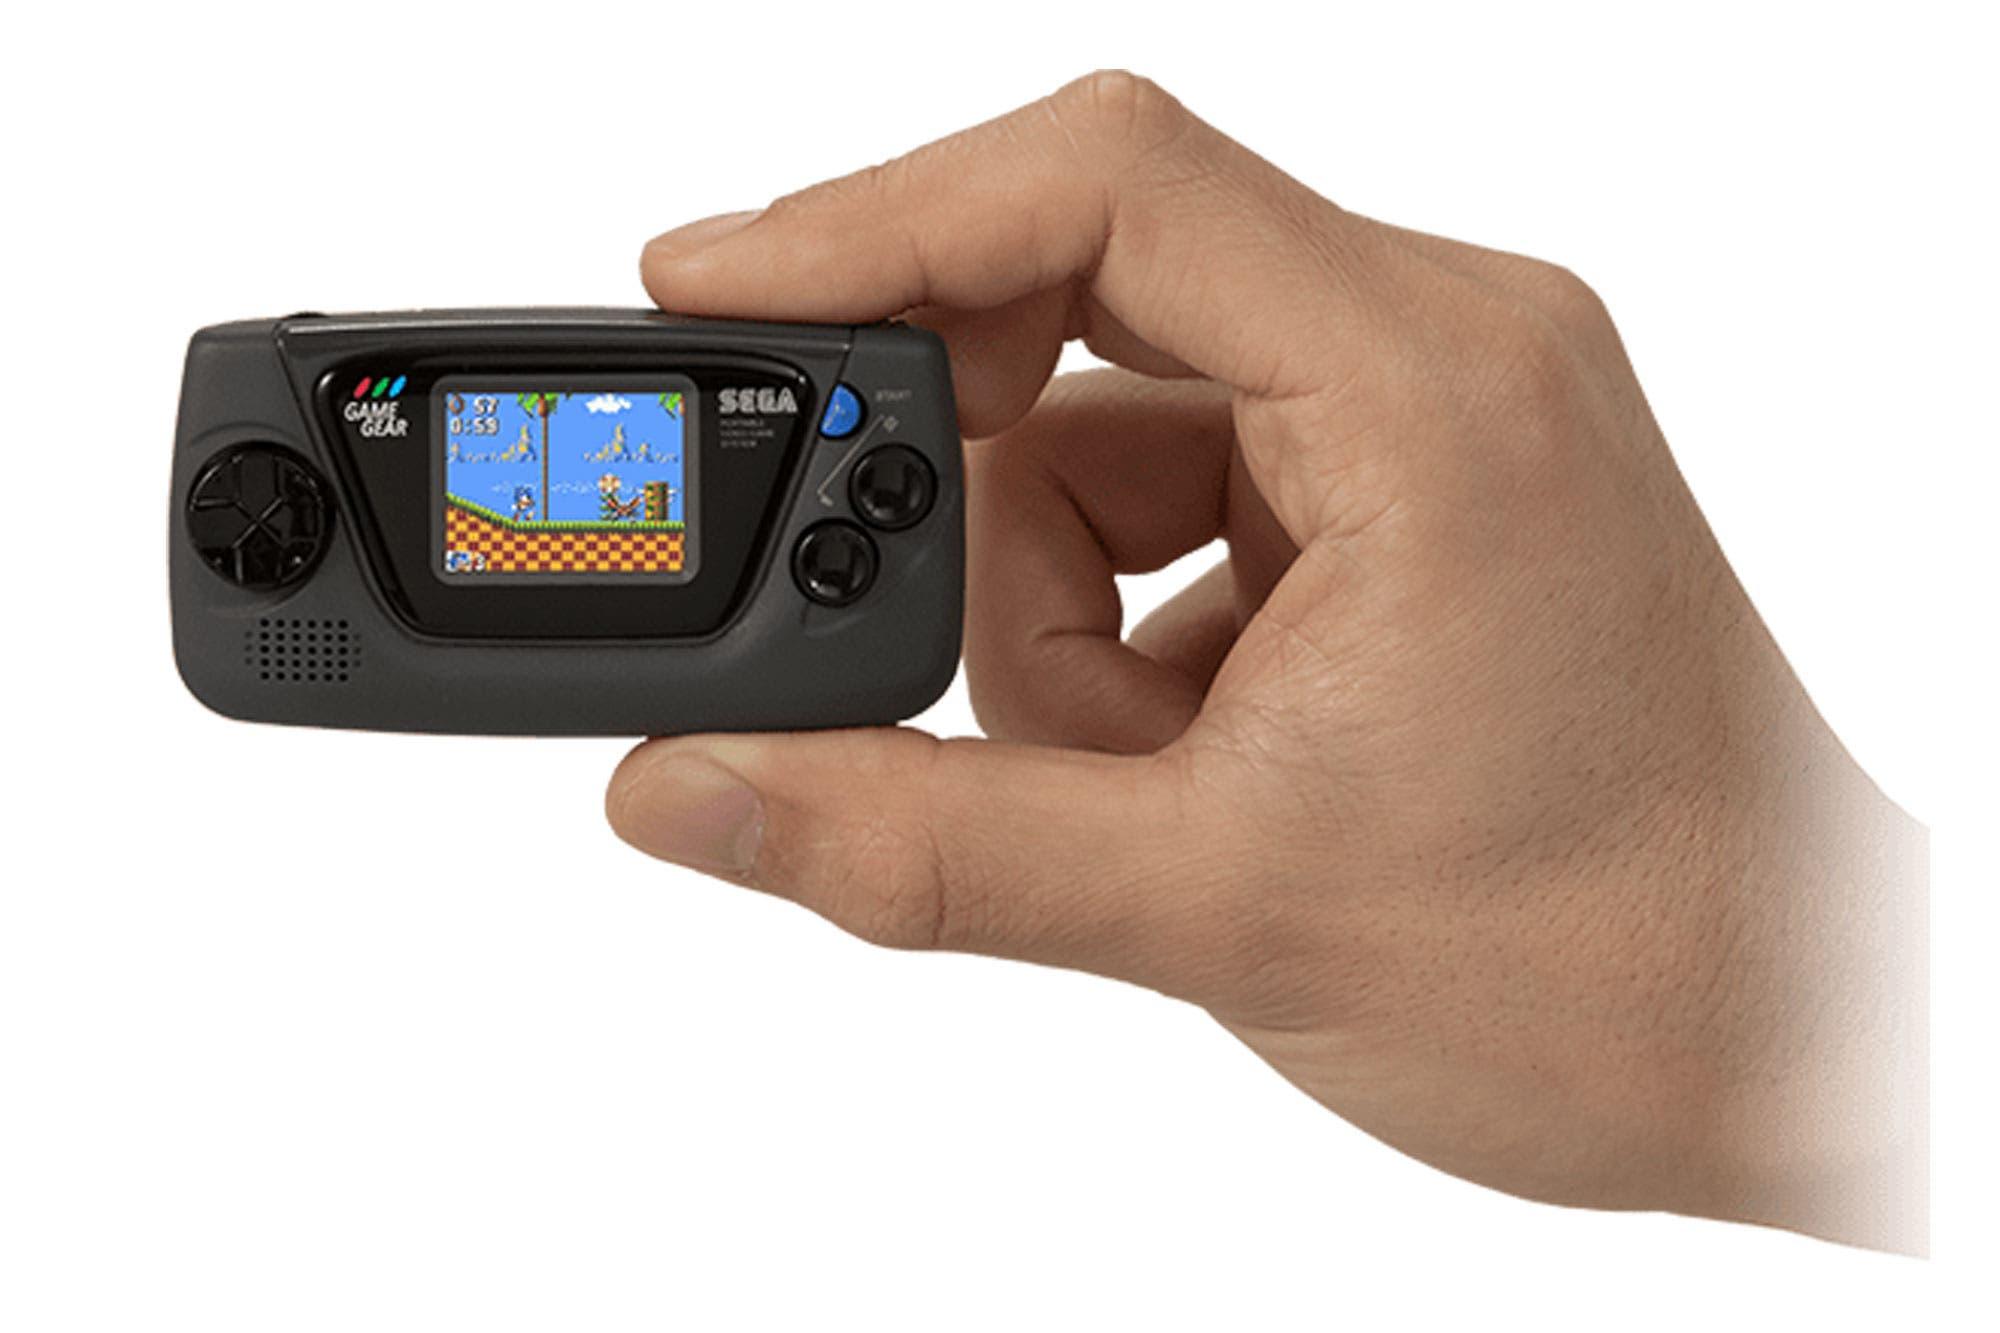 Game Gear Micro: Sega revive su consola retro portátil con un diseño compacto